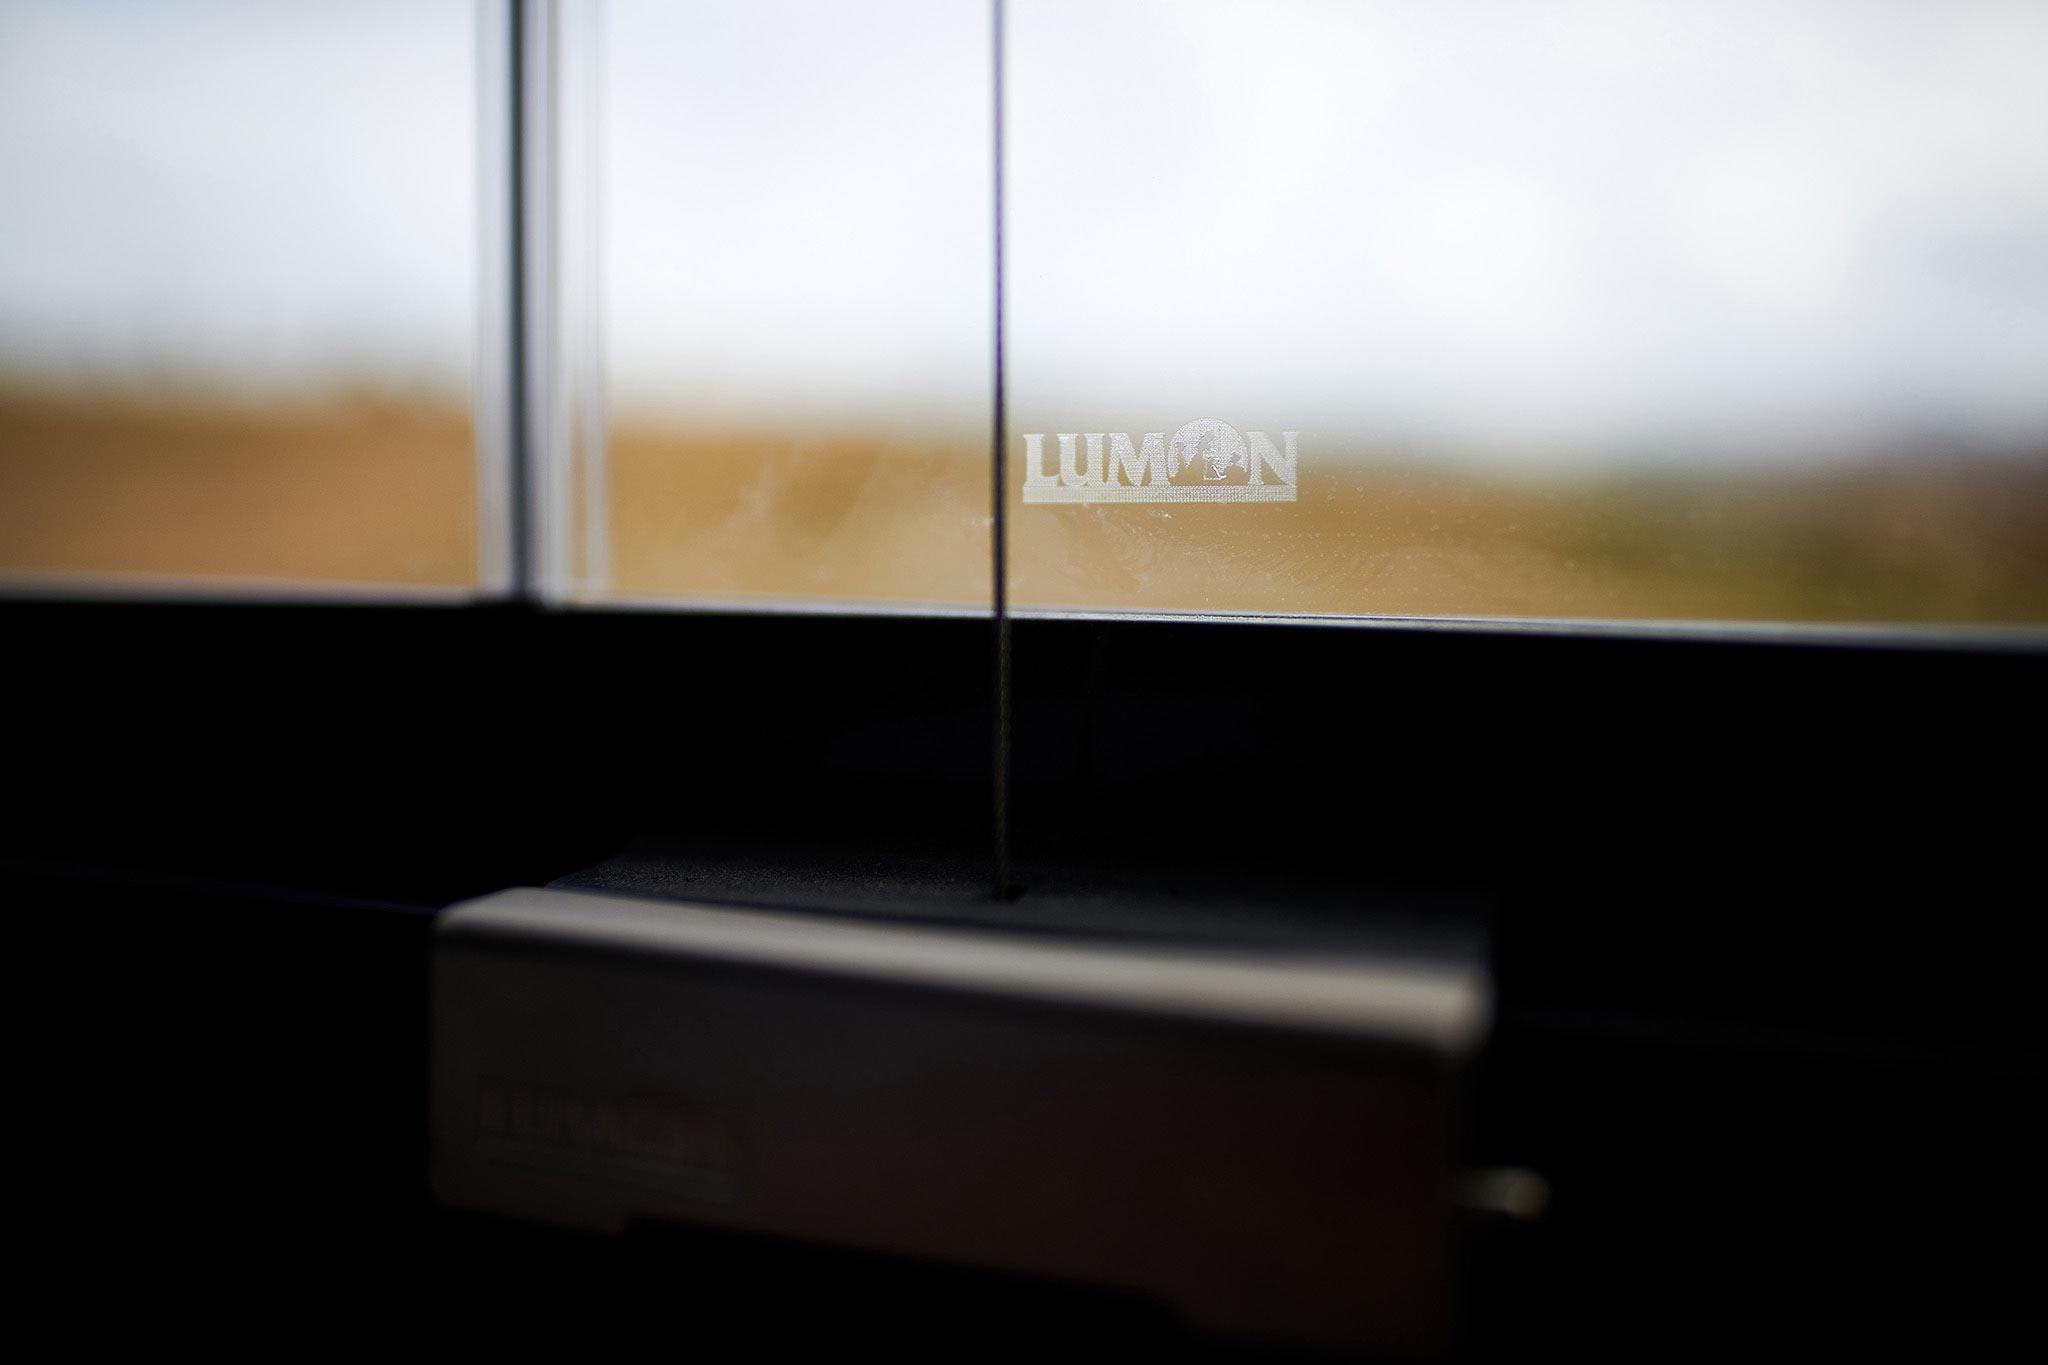 Detalle maneta cerradura cortina cristal lumon